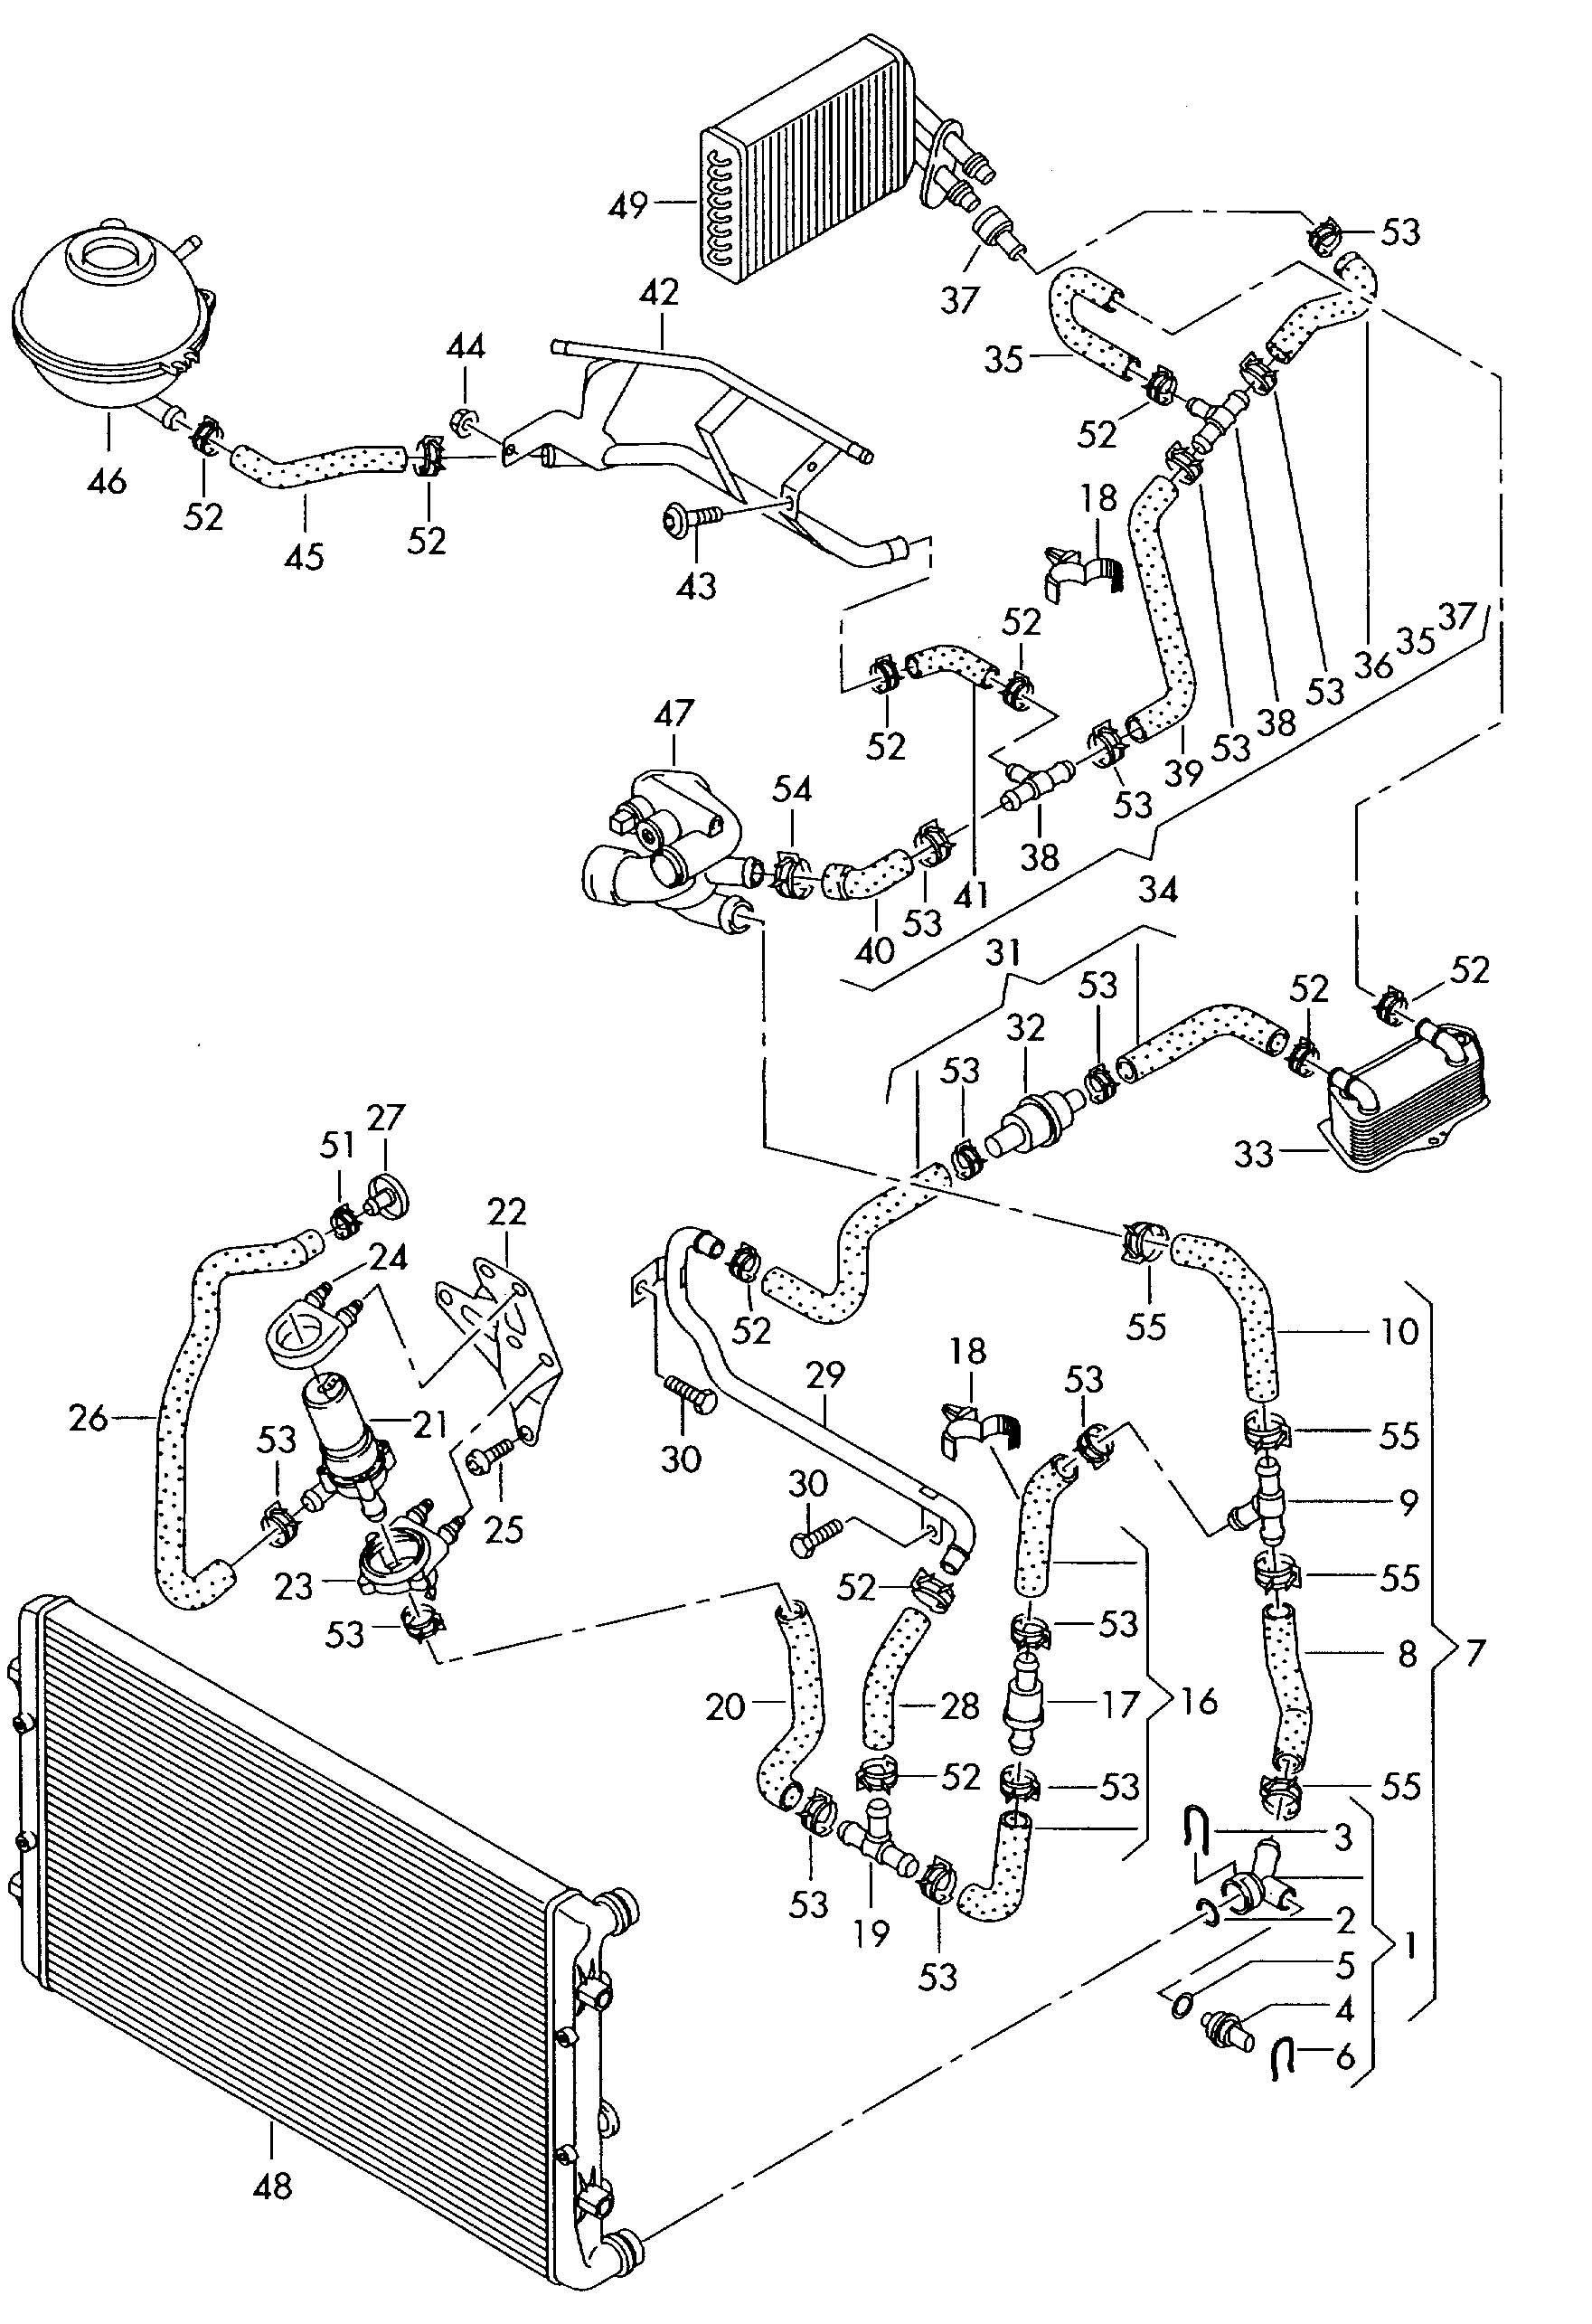 Audi A3 Cooling System Diagram | Audi | Audi a3, Audi, Cooling system